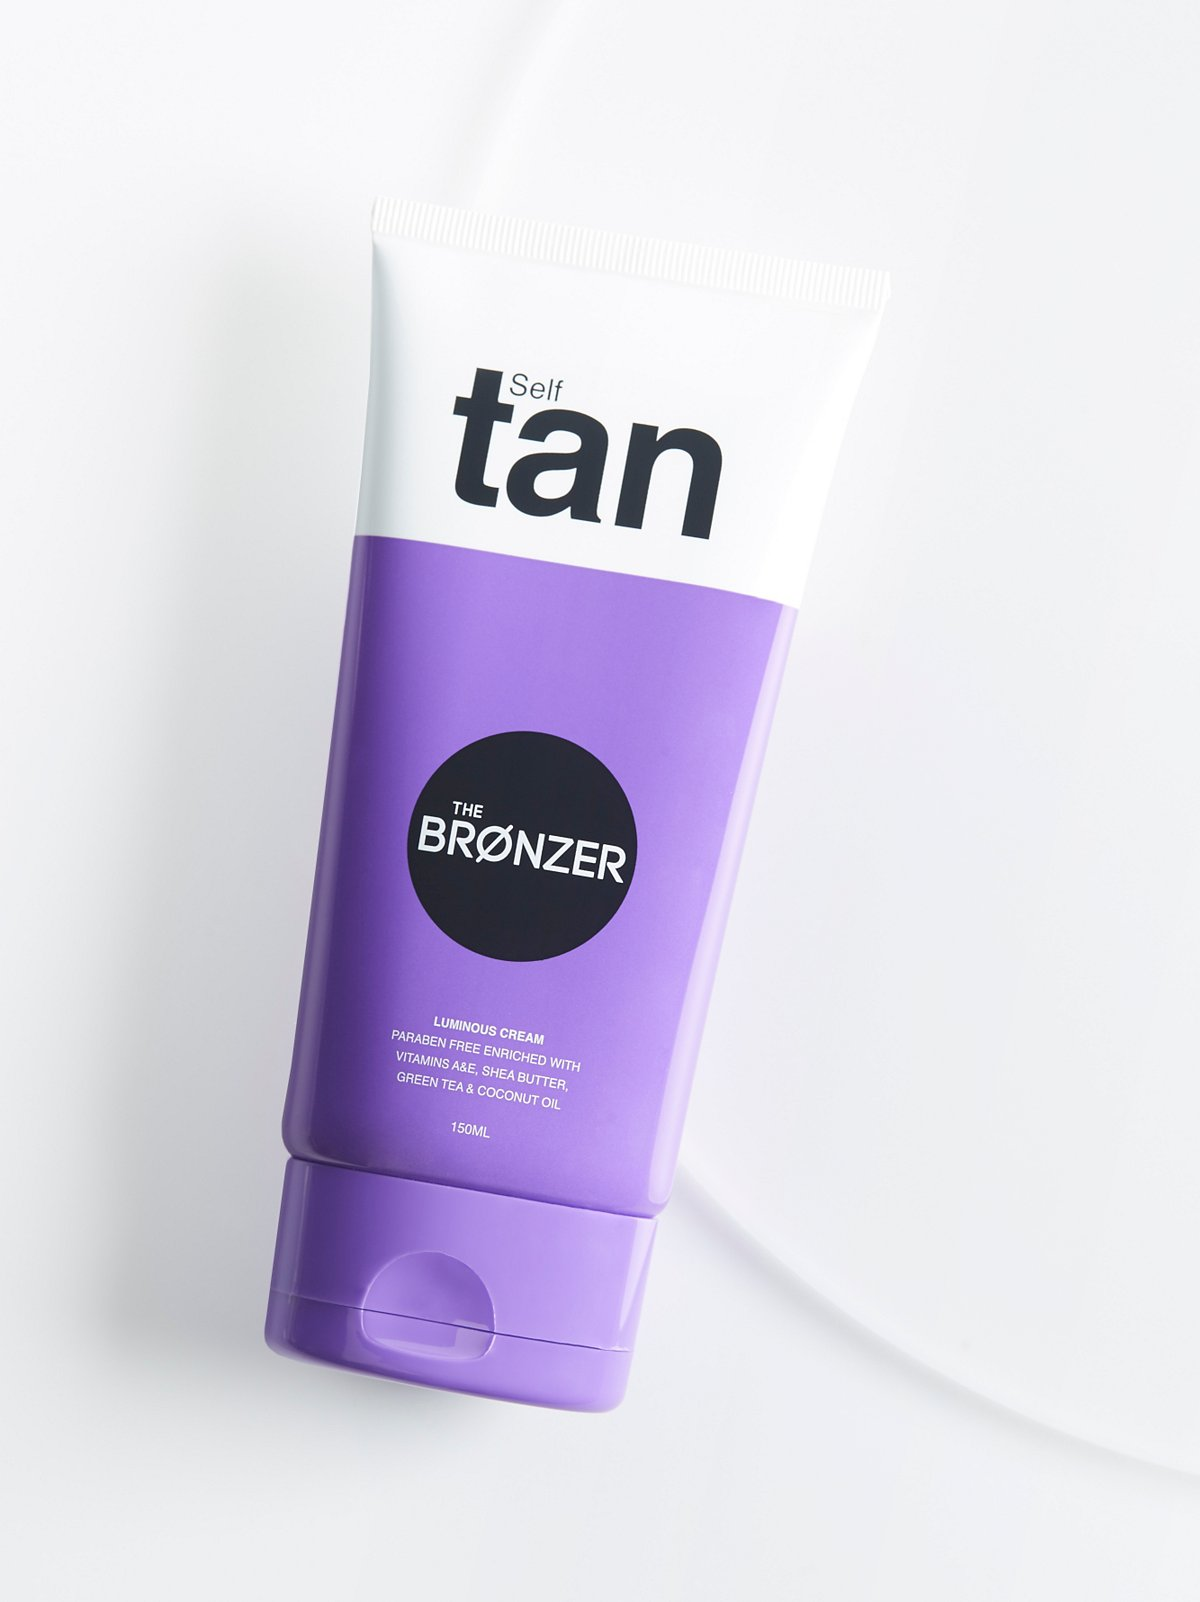 The Bronzer Self Tan